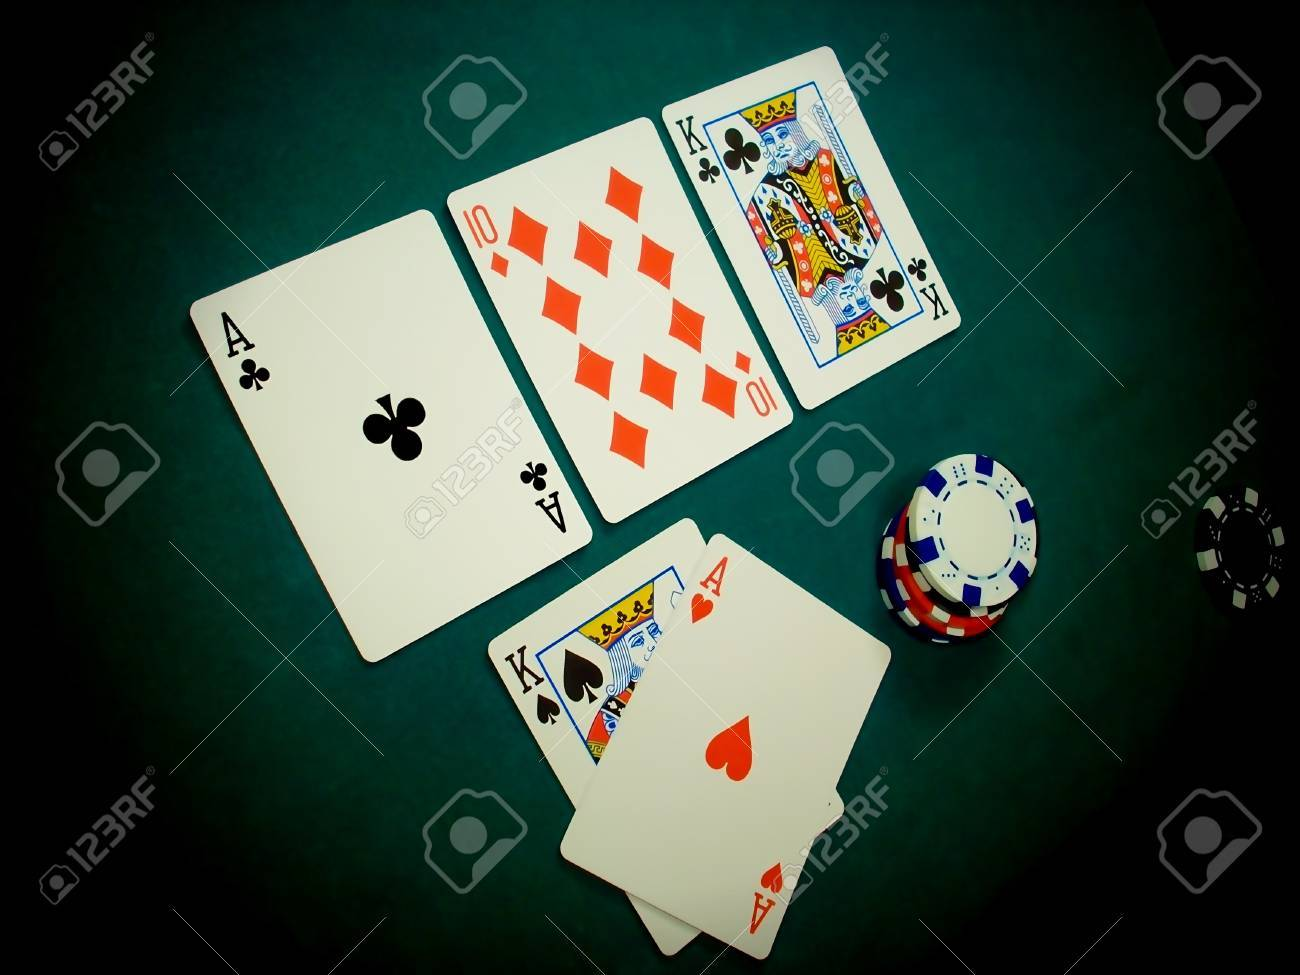 Free play at atlantic city casinos